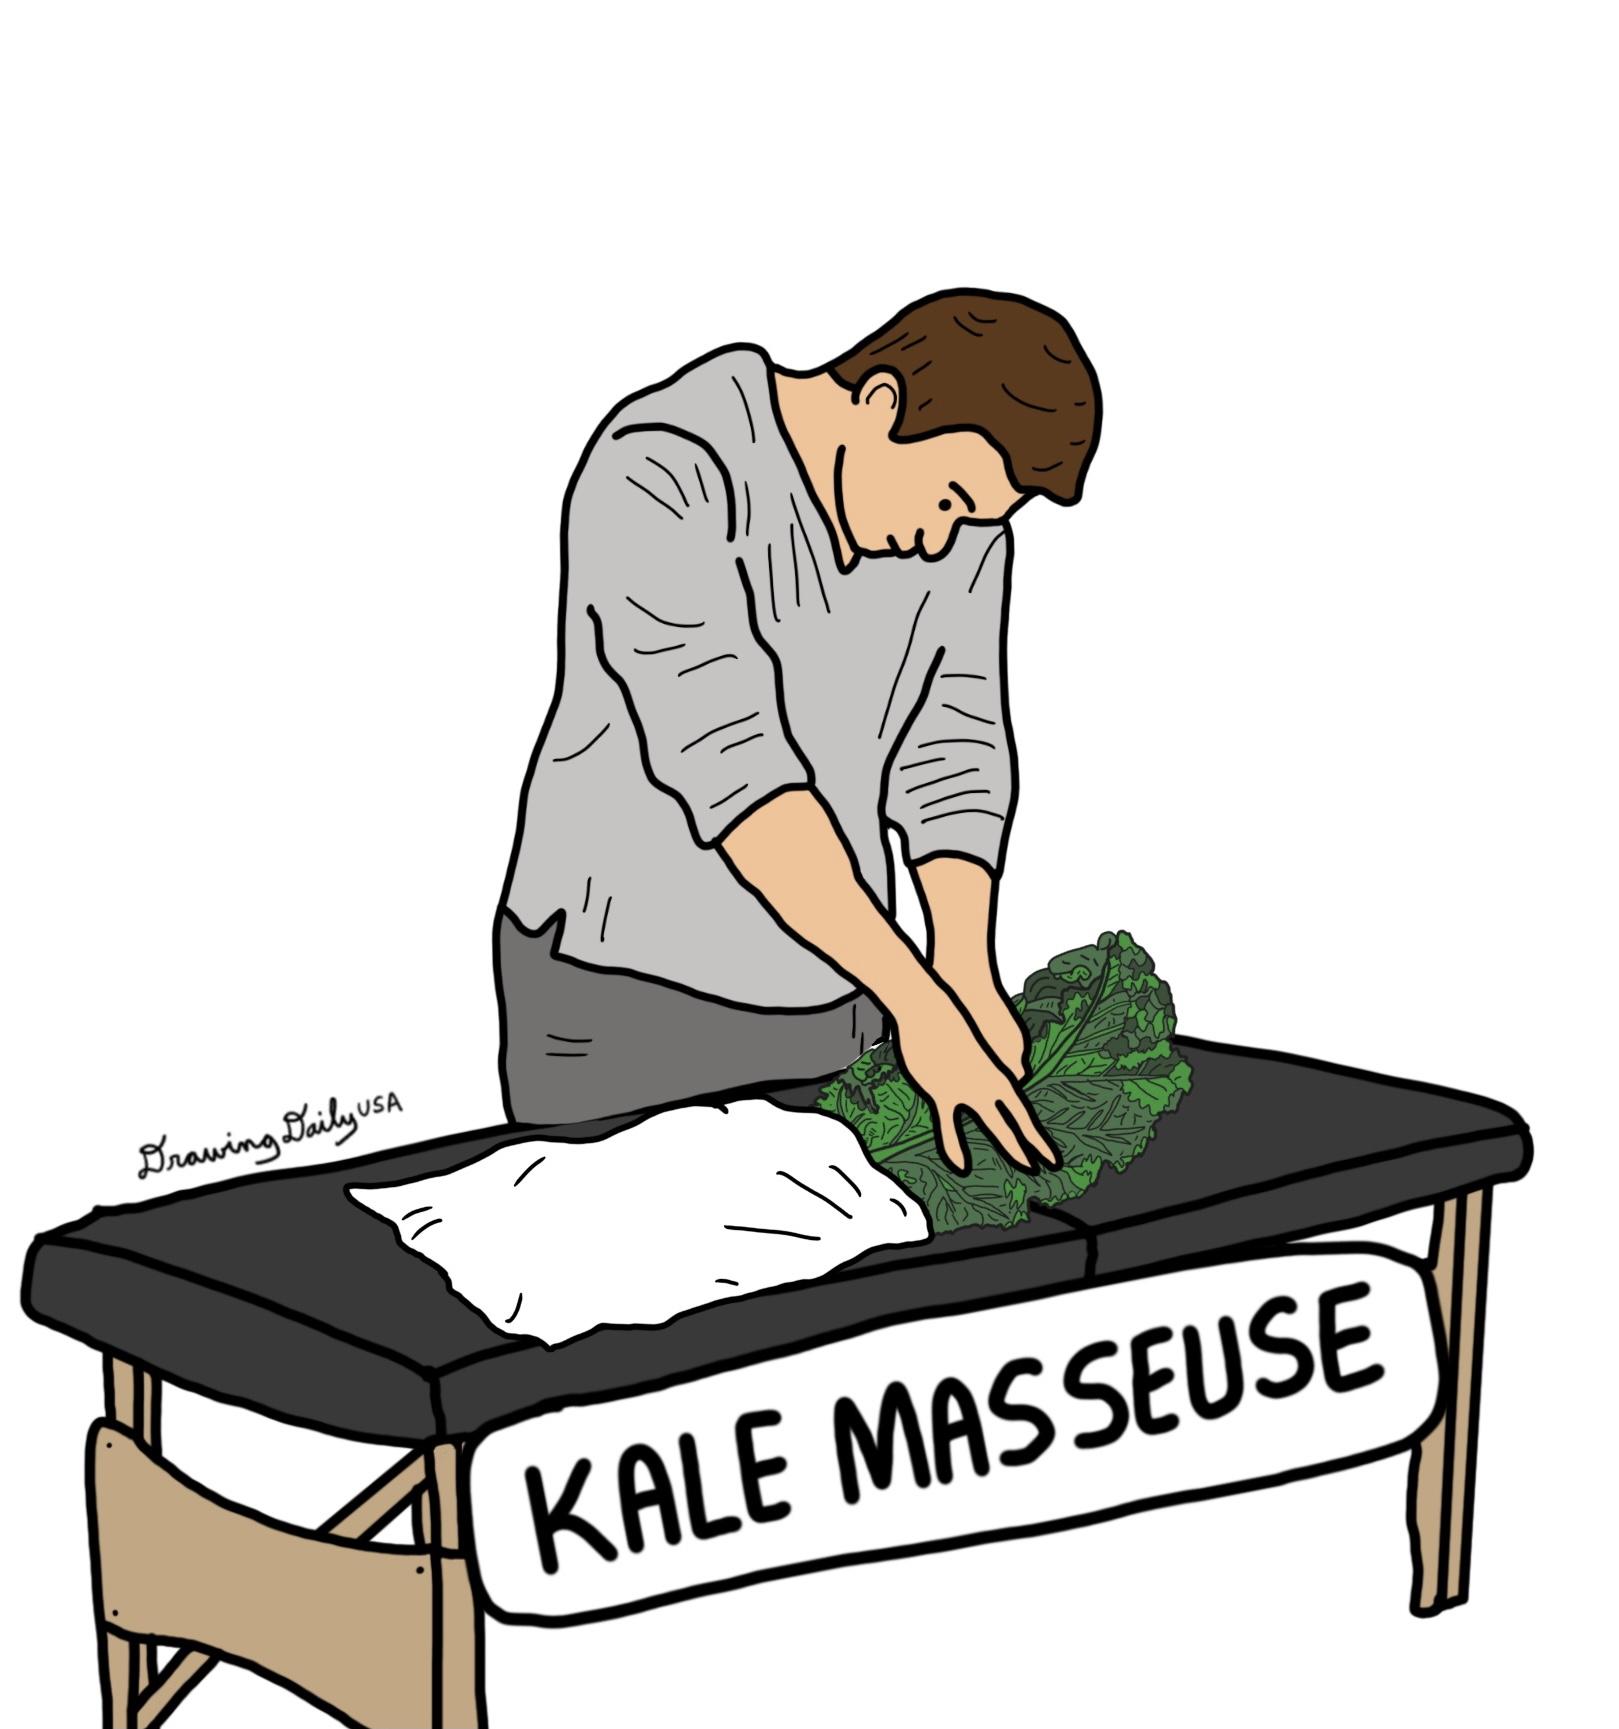 Kale Masseuse